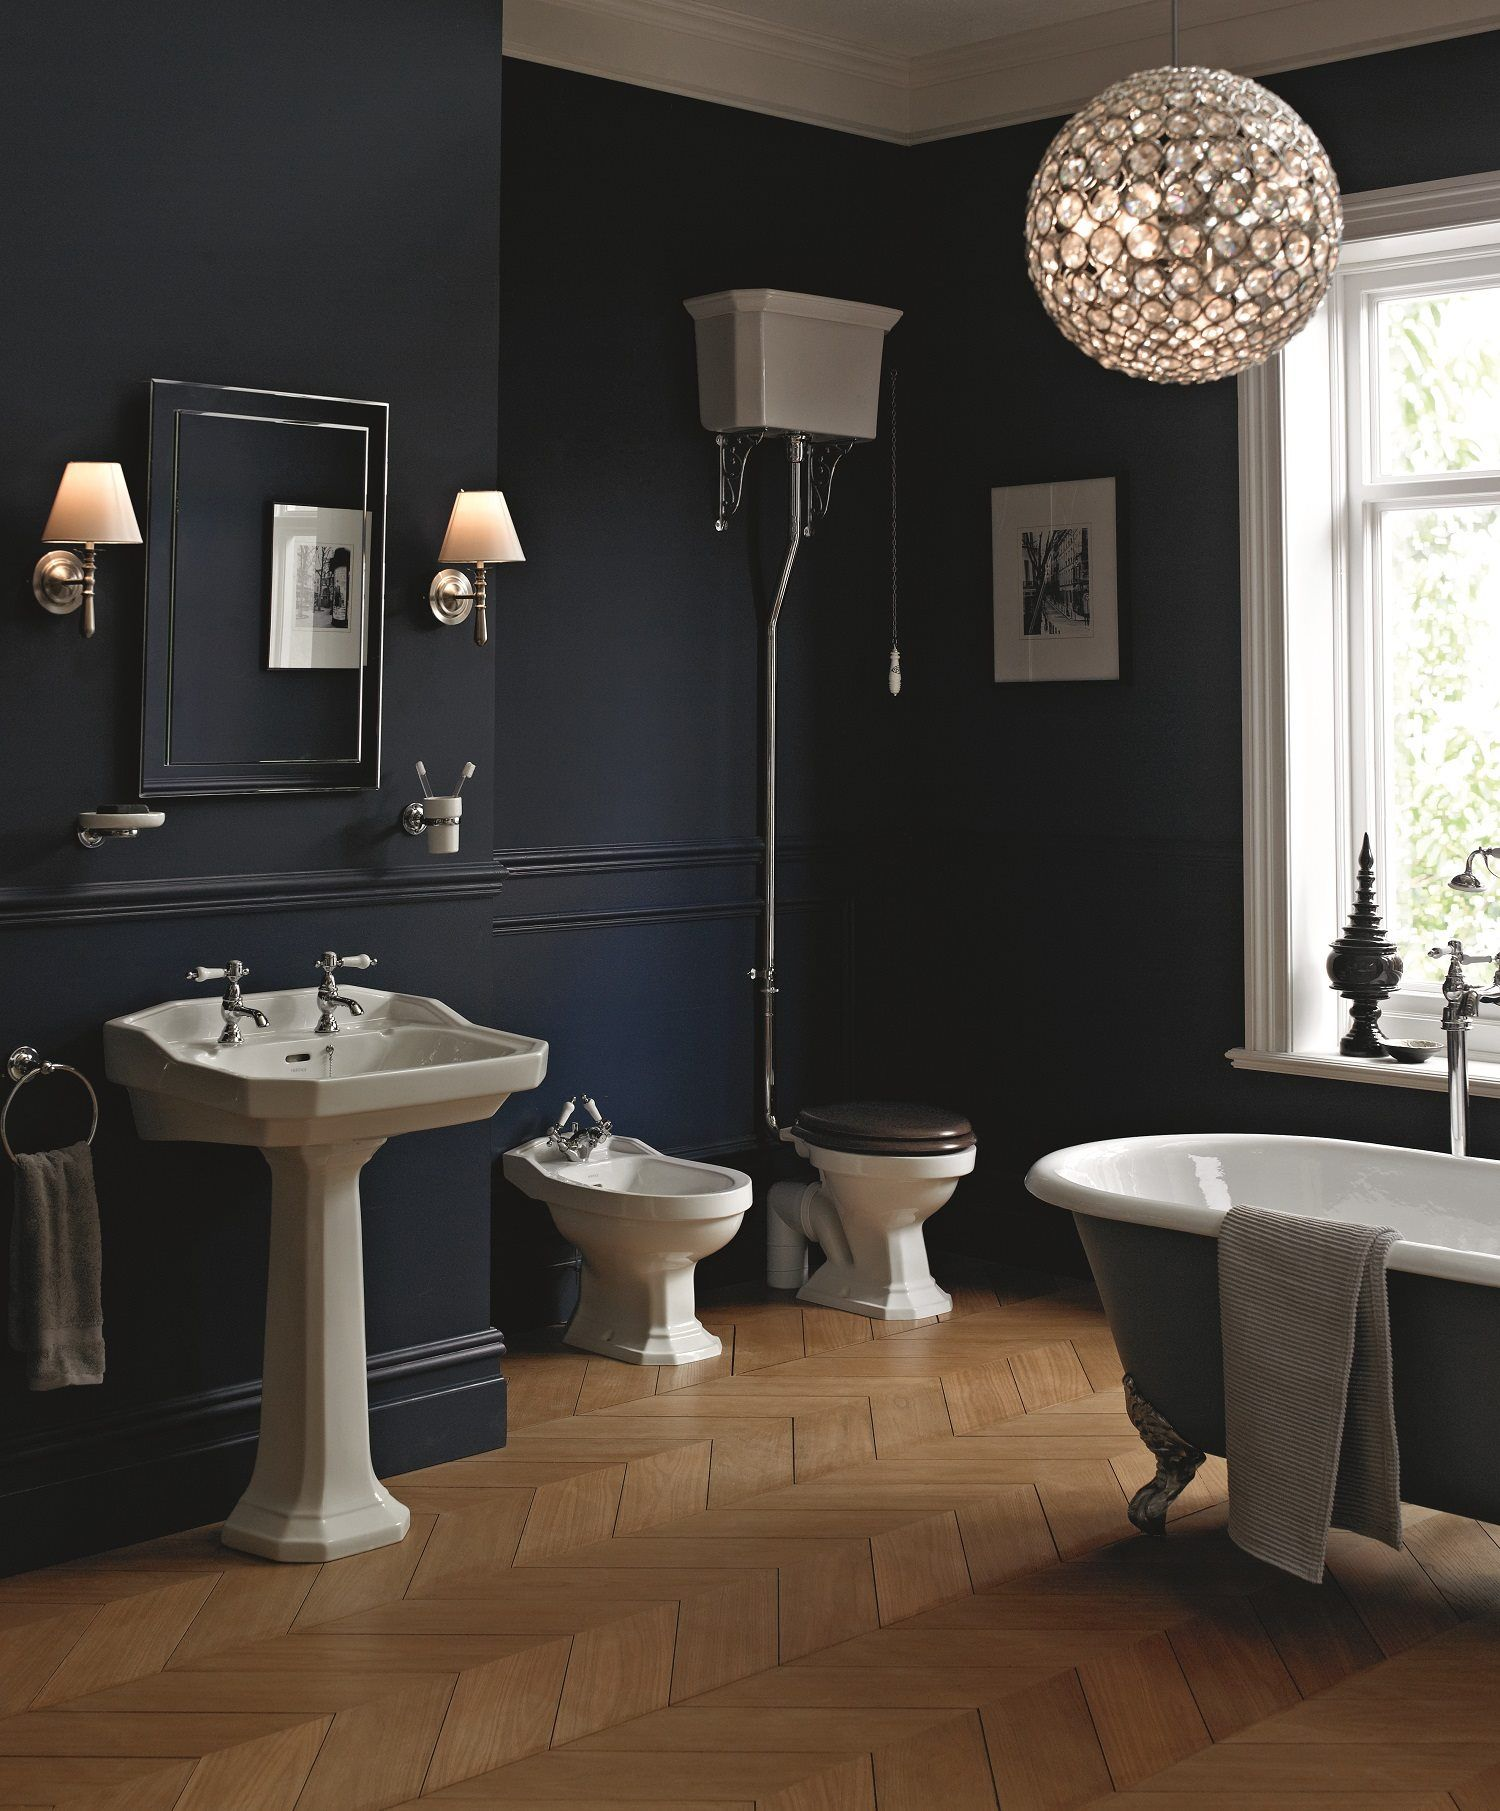 Heritage bathroom furniture - Heritage Bathrooms Granley Suite Heritagebathrooms Traditional Granley Traditionalbathroom Luxury